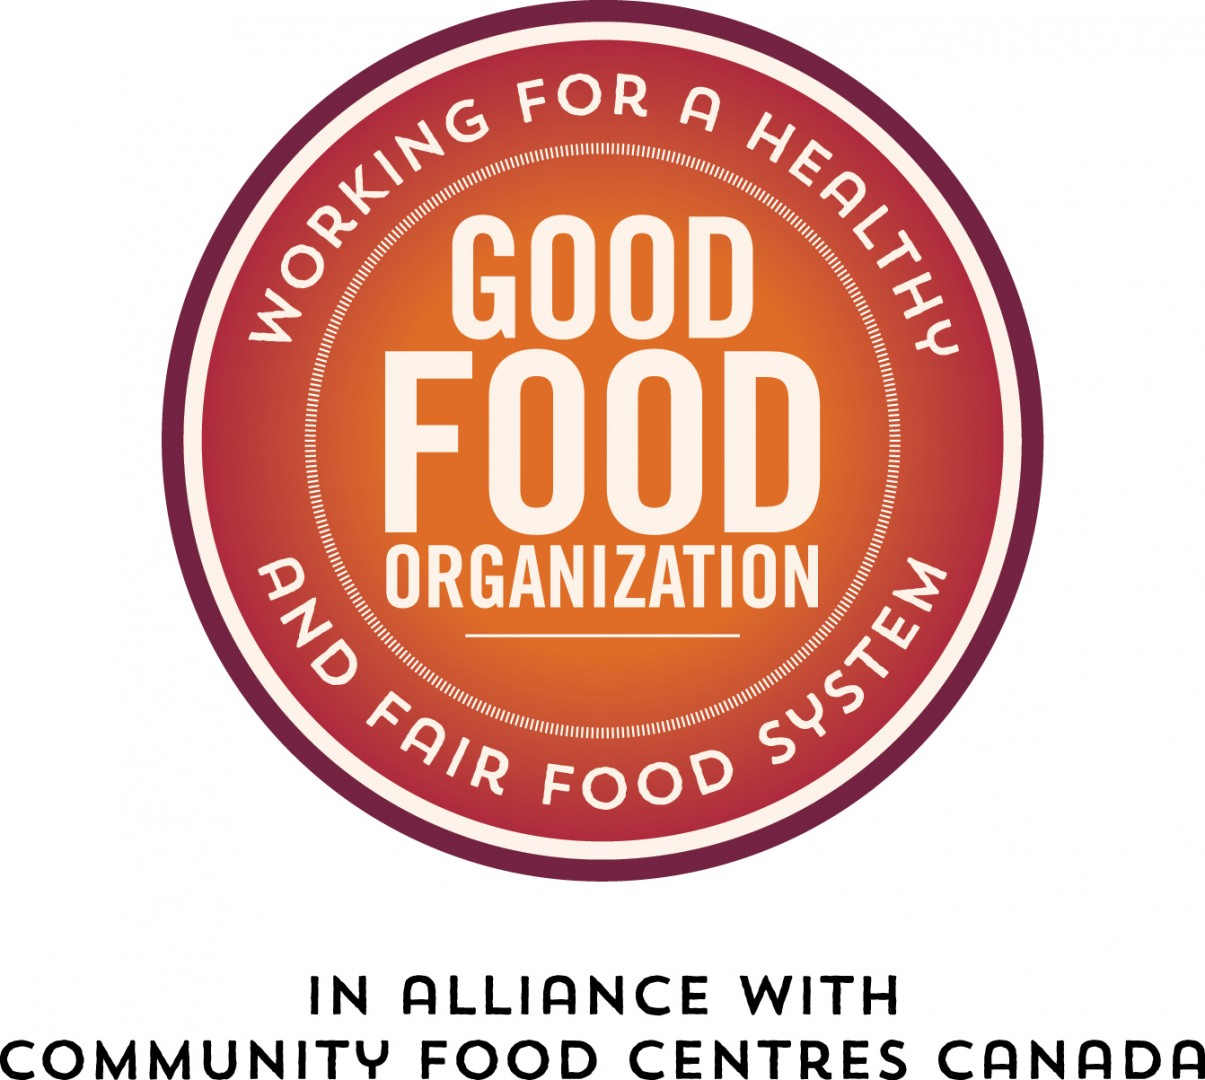 Good Food Organization